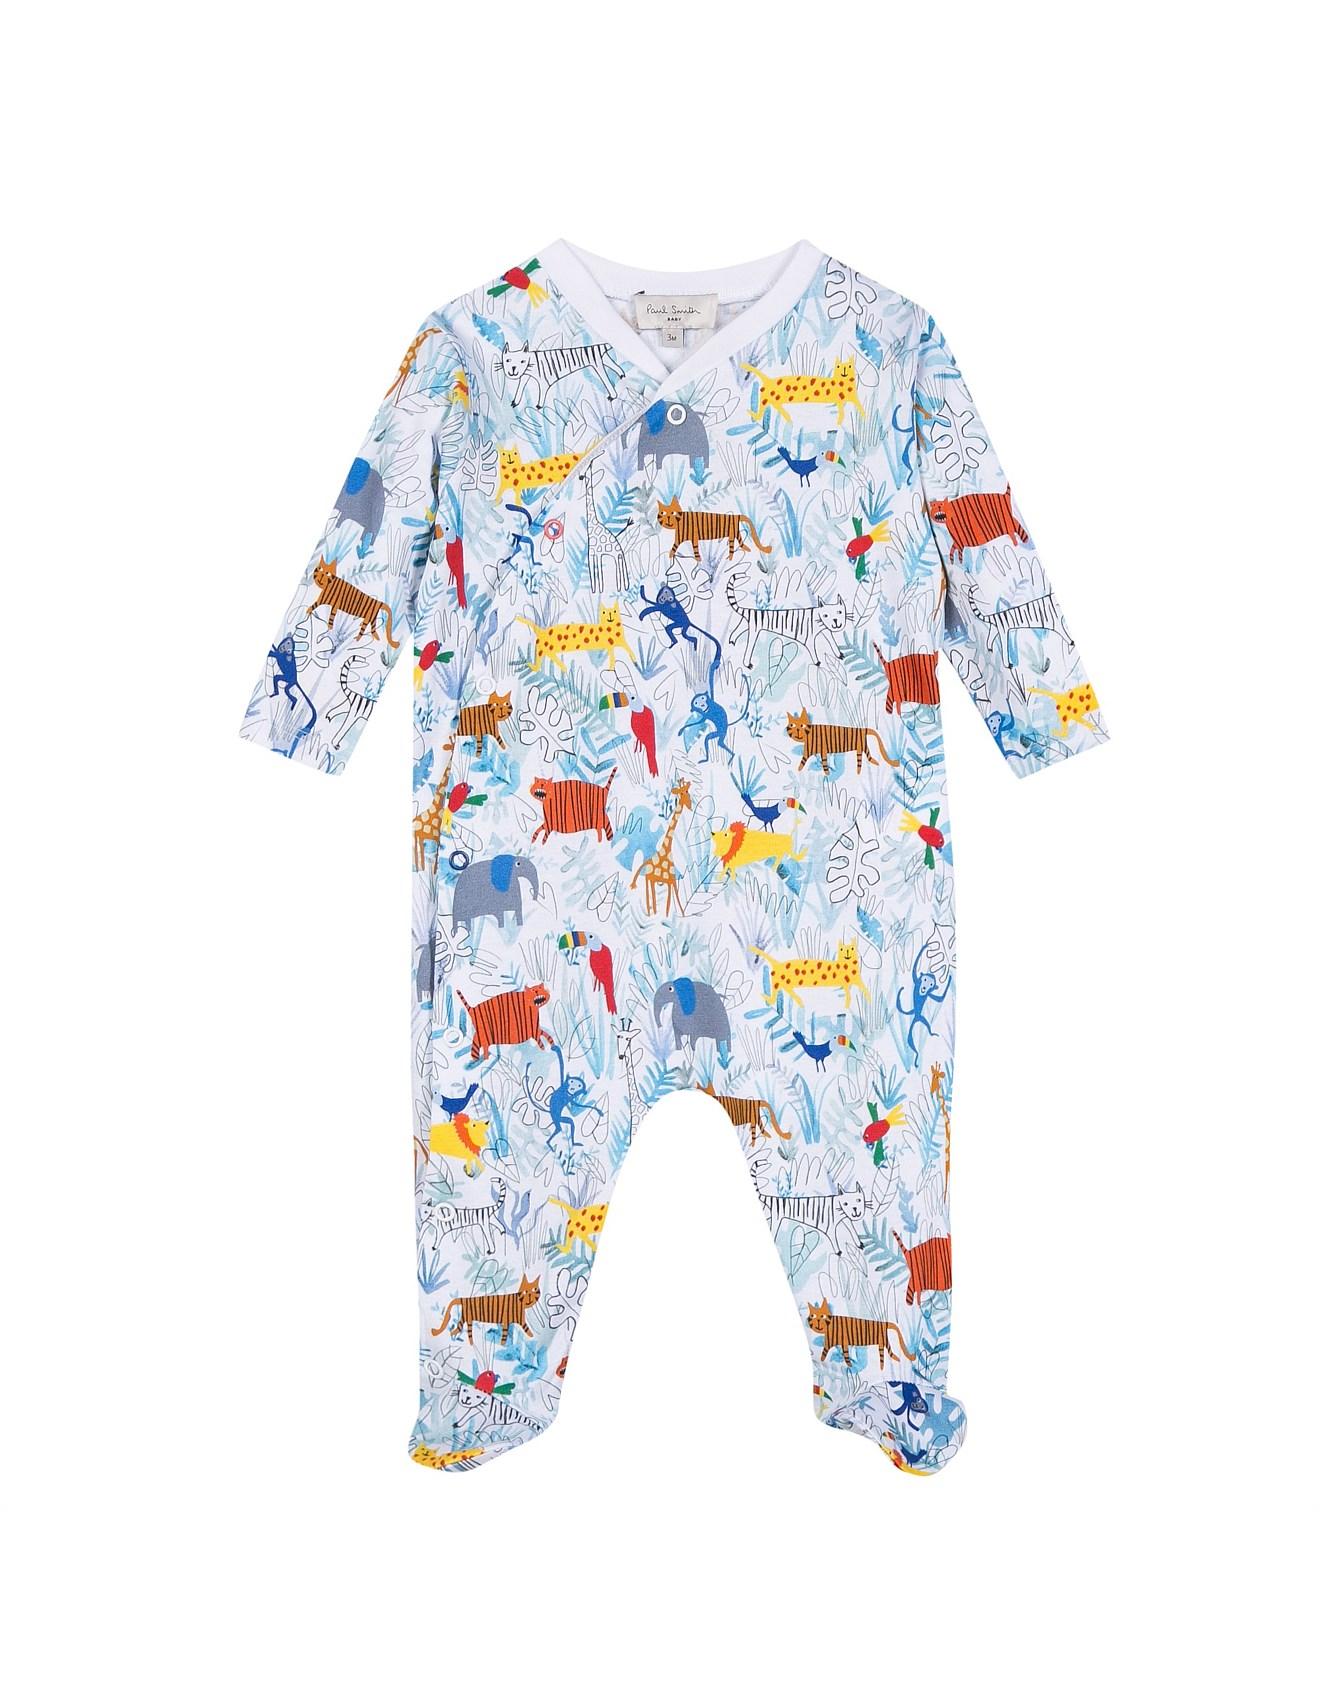 9e9e70646 Baby Clothing